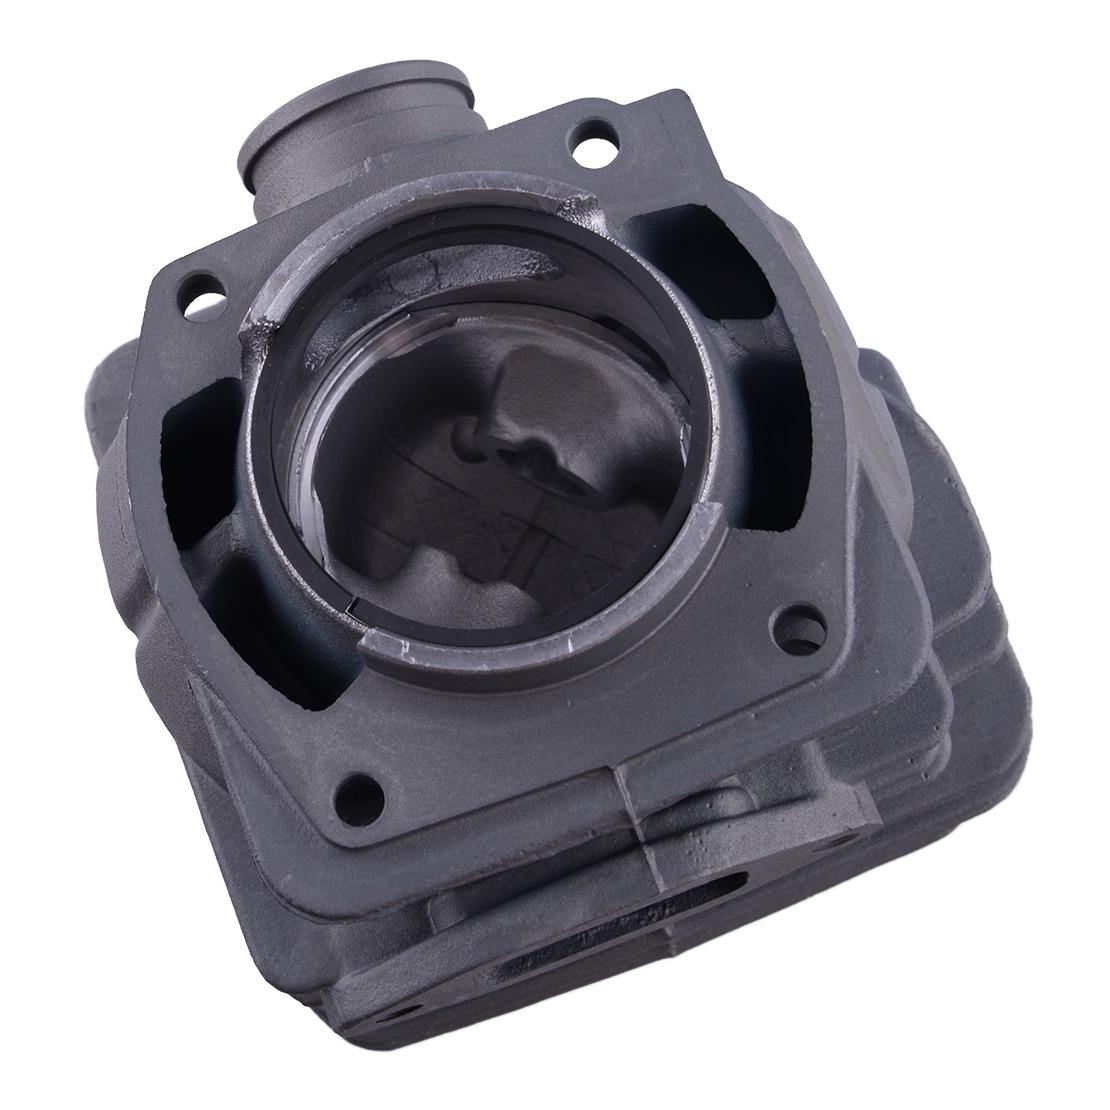 Nikasil Gasket Piston Cylinder 2165 For 2071 2171 Jonsered Fit 2163 503939372 CS 50mm Kit 2063